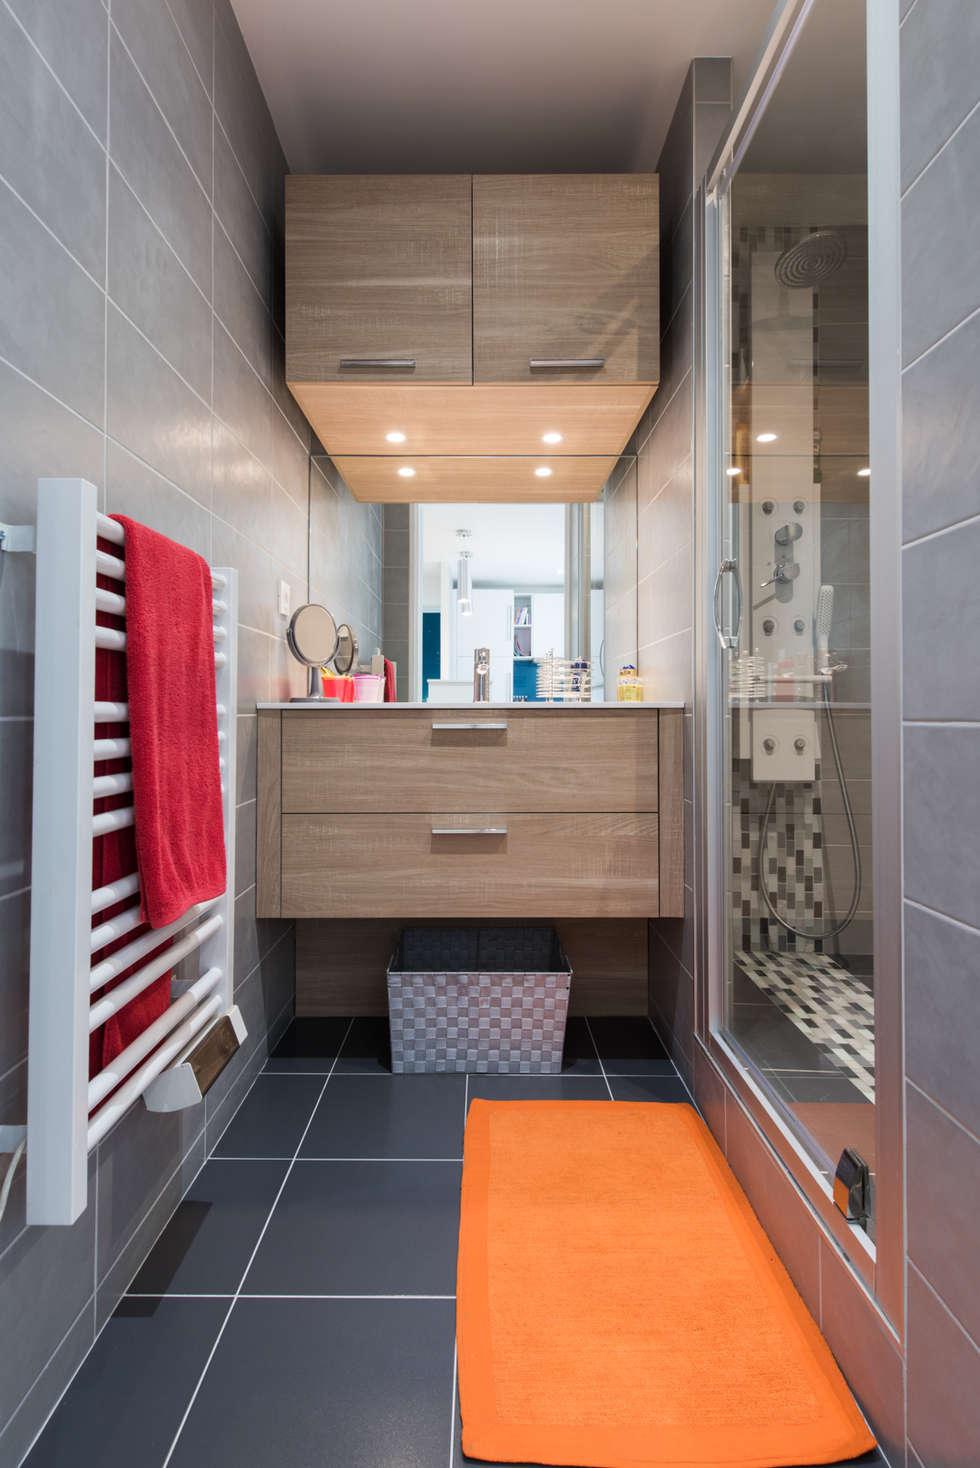 Merveilleux Banheiros Ecléticos Por LA CUISINE DANS LE BAIN SK CONCEPT